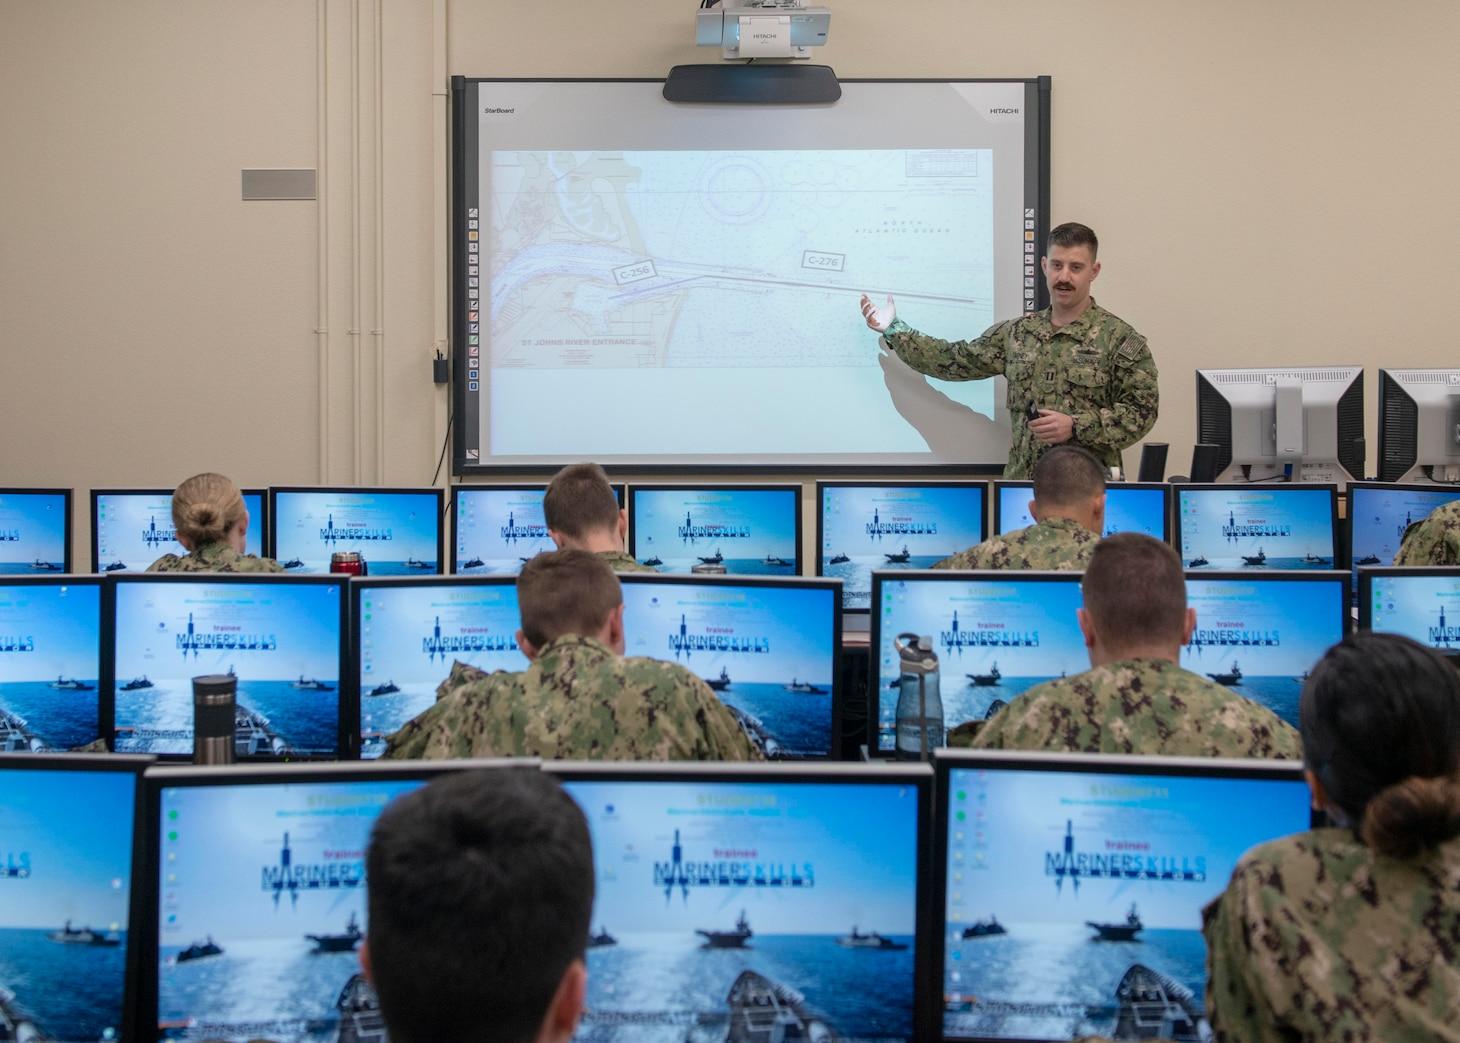 Lt. Erik Farney briefs students